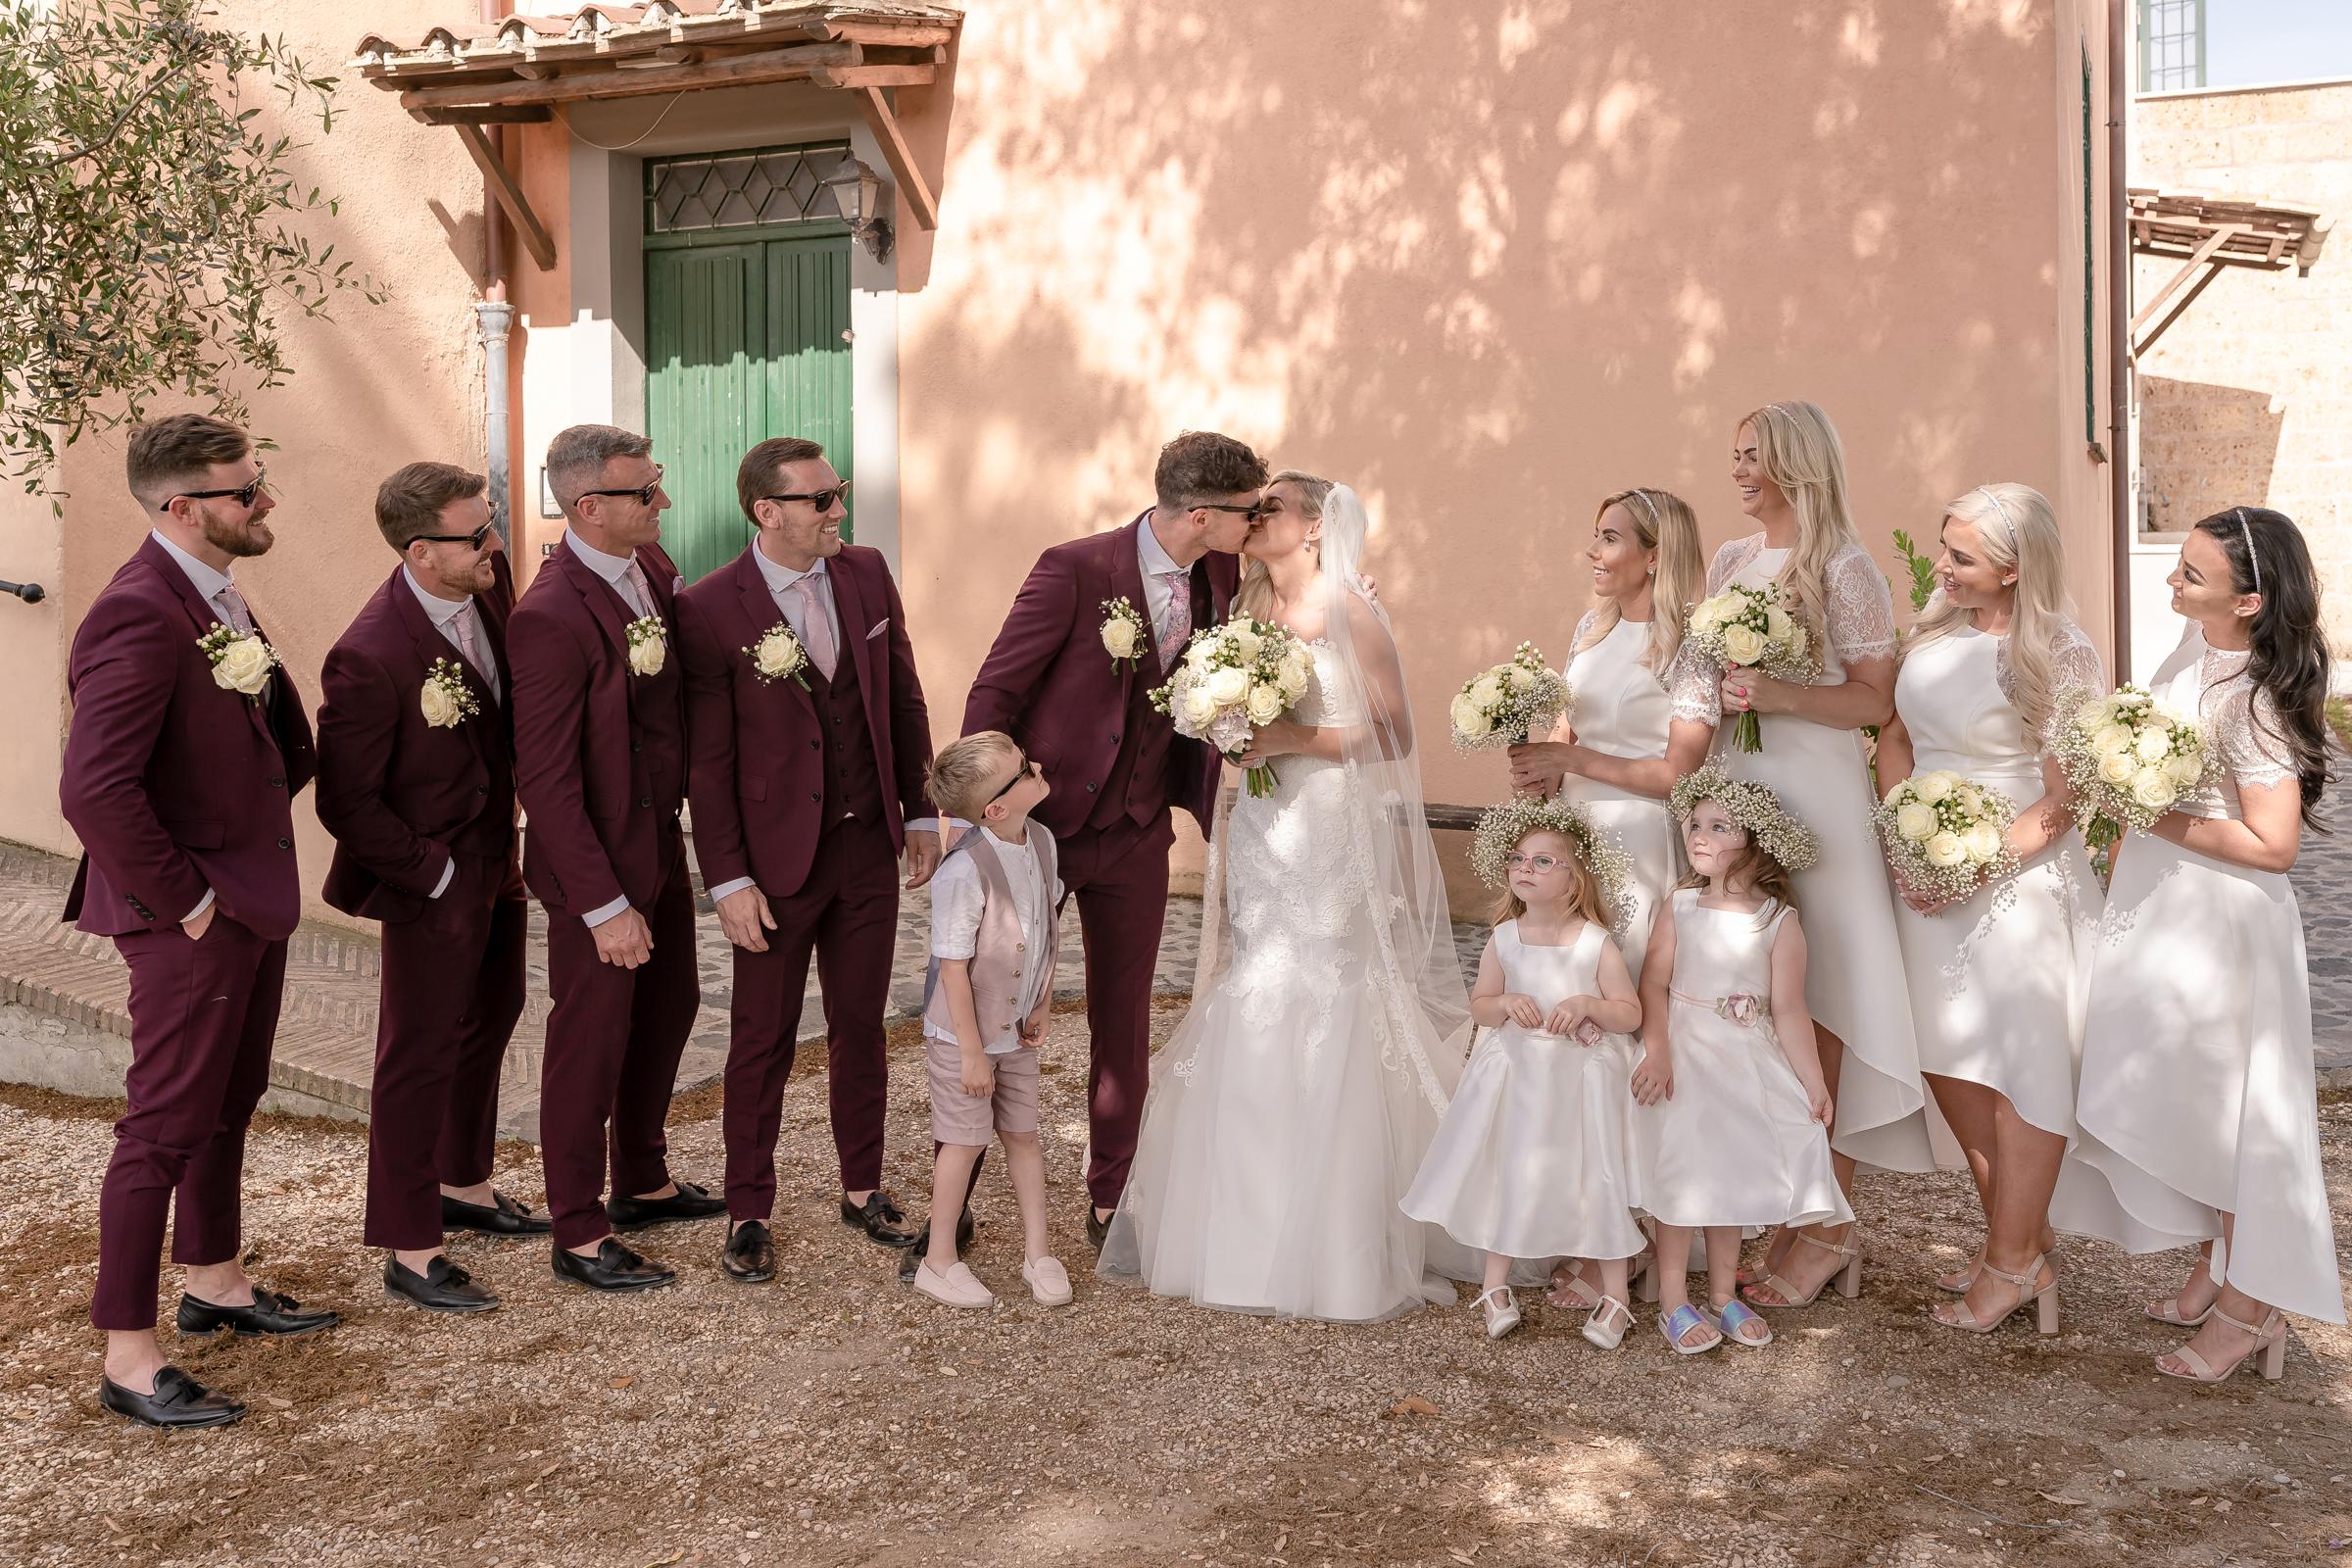 Borgo di tragliata Wedding-23.jpg